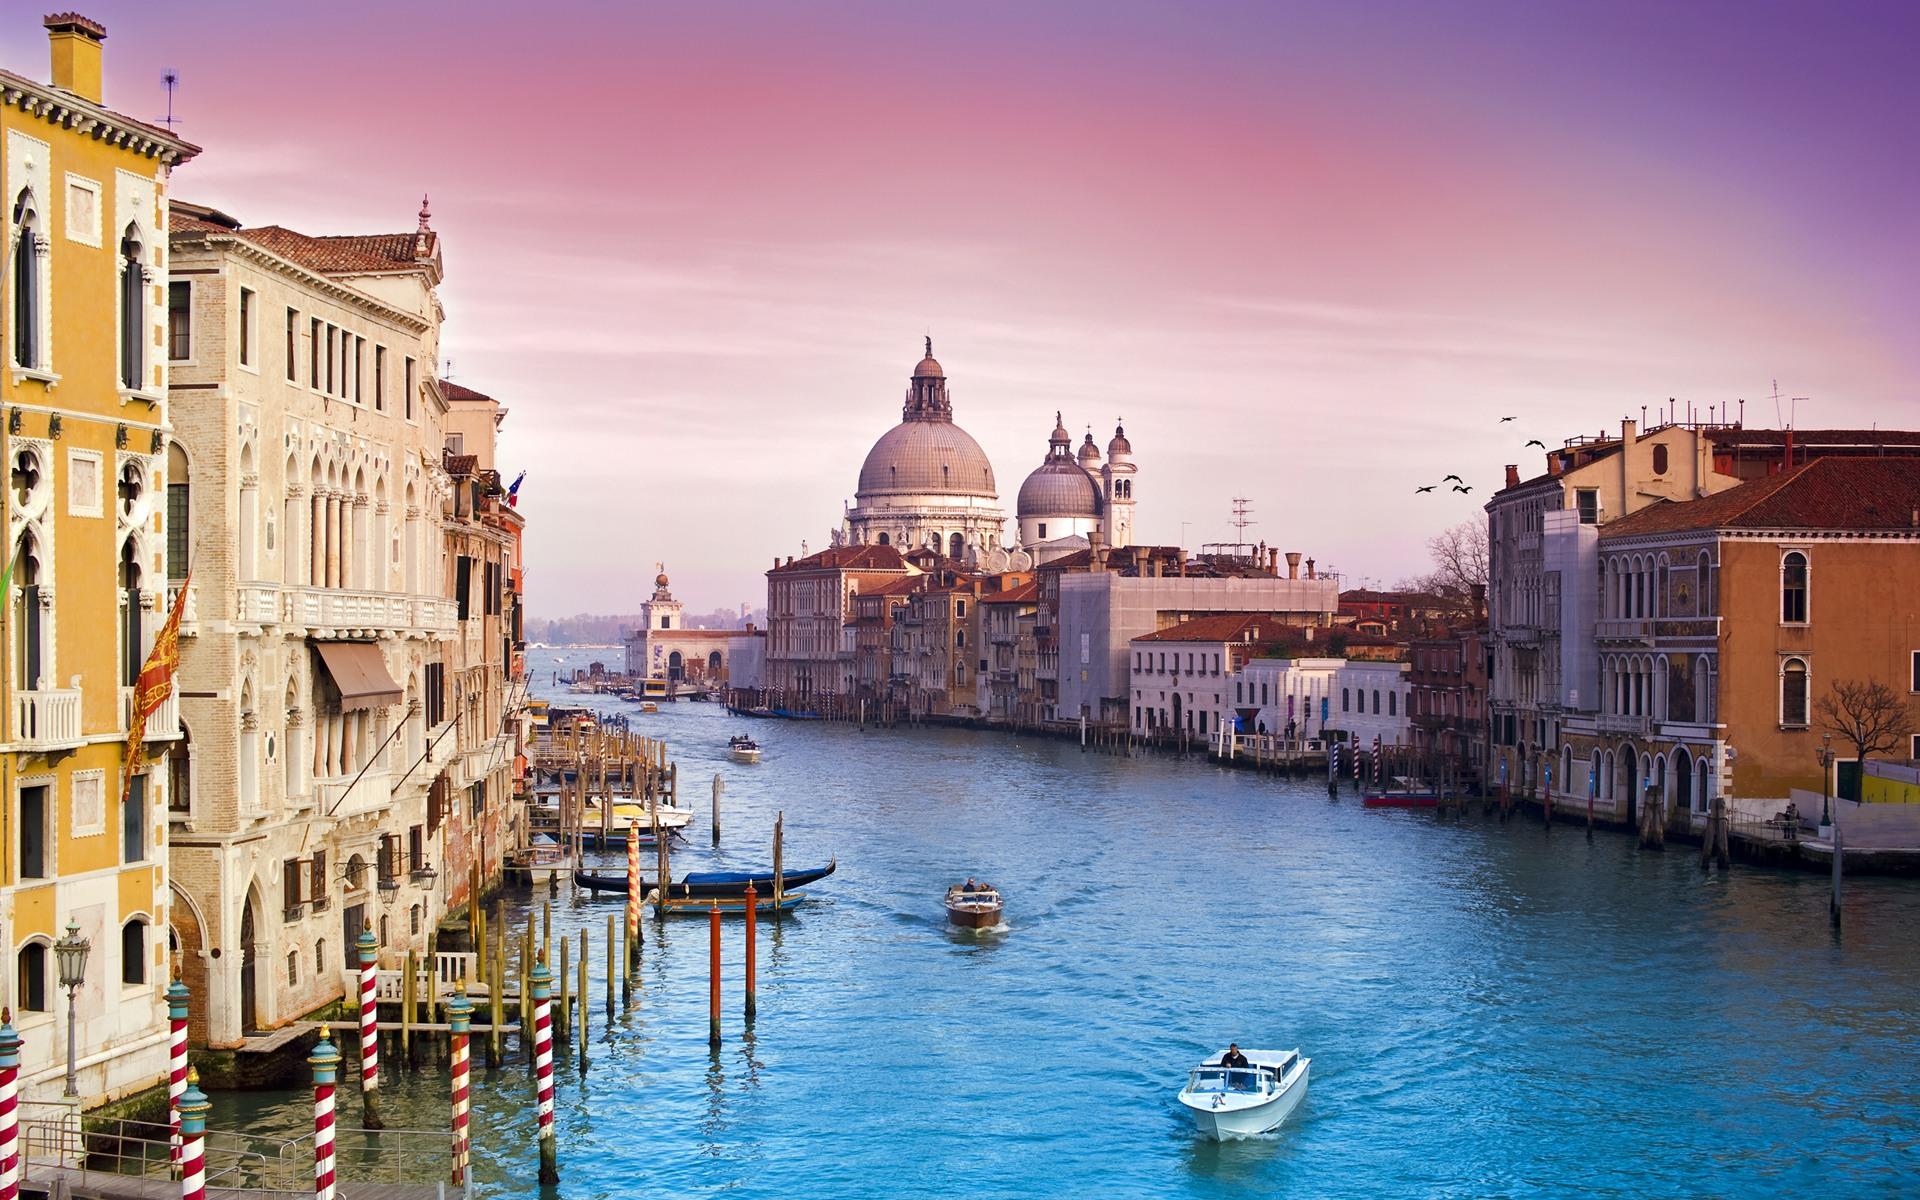 Venice-(Italy).jpg